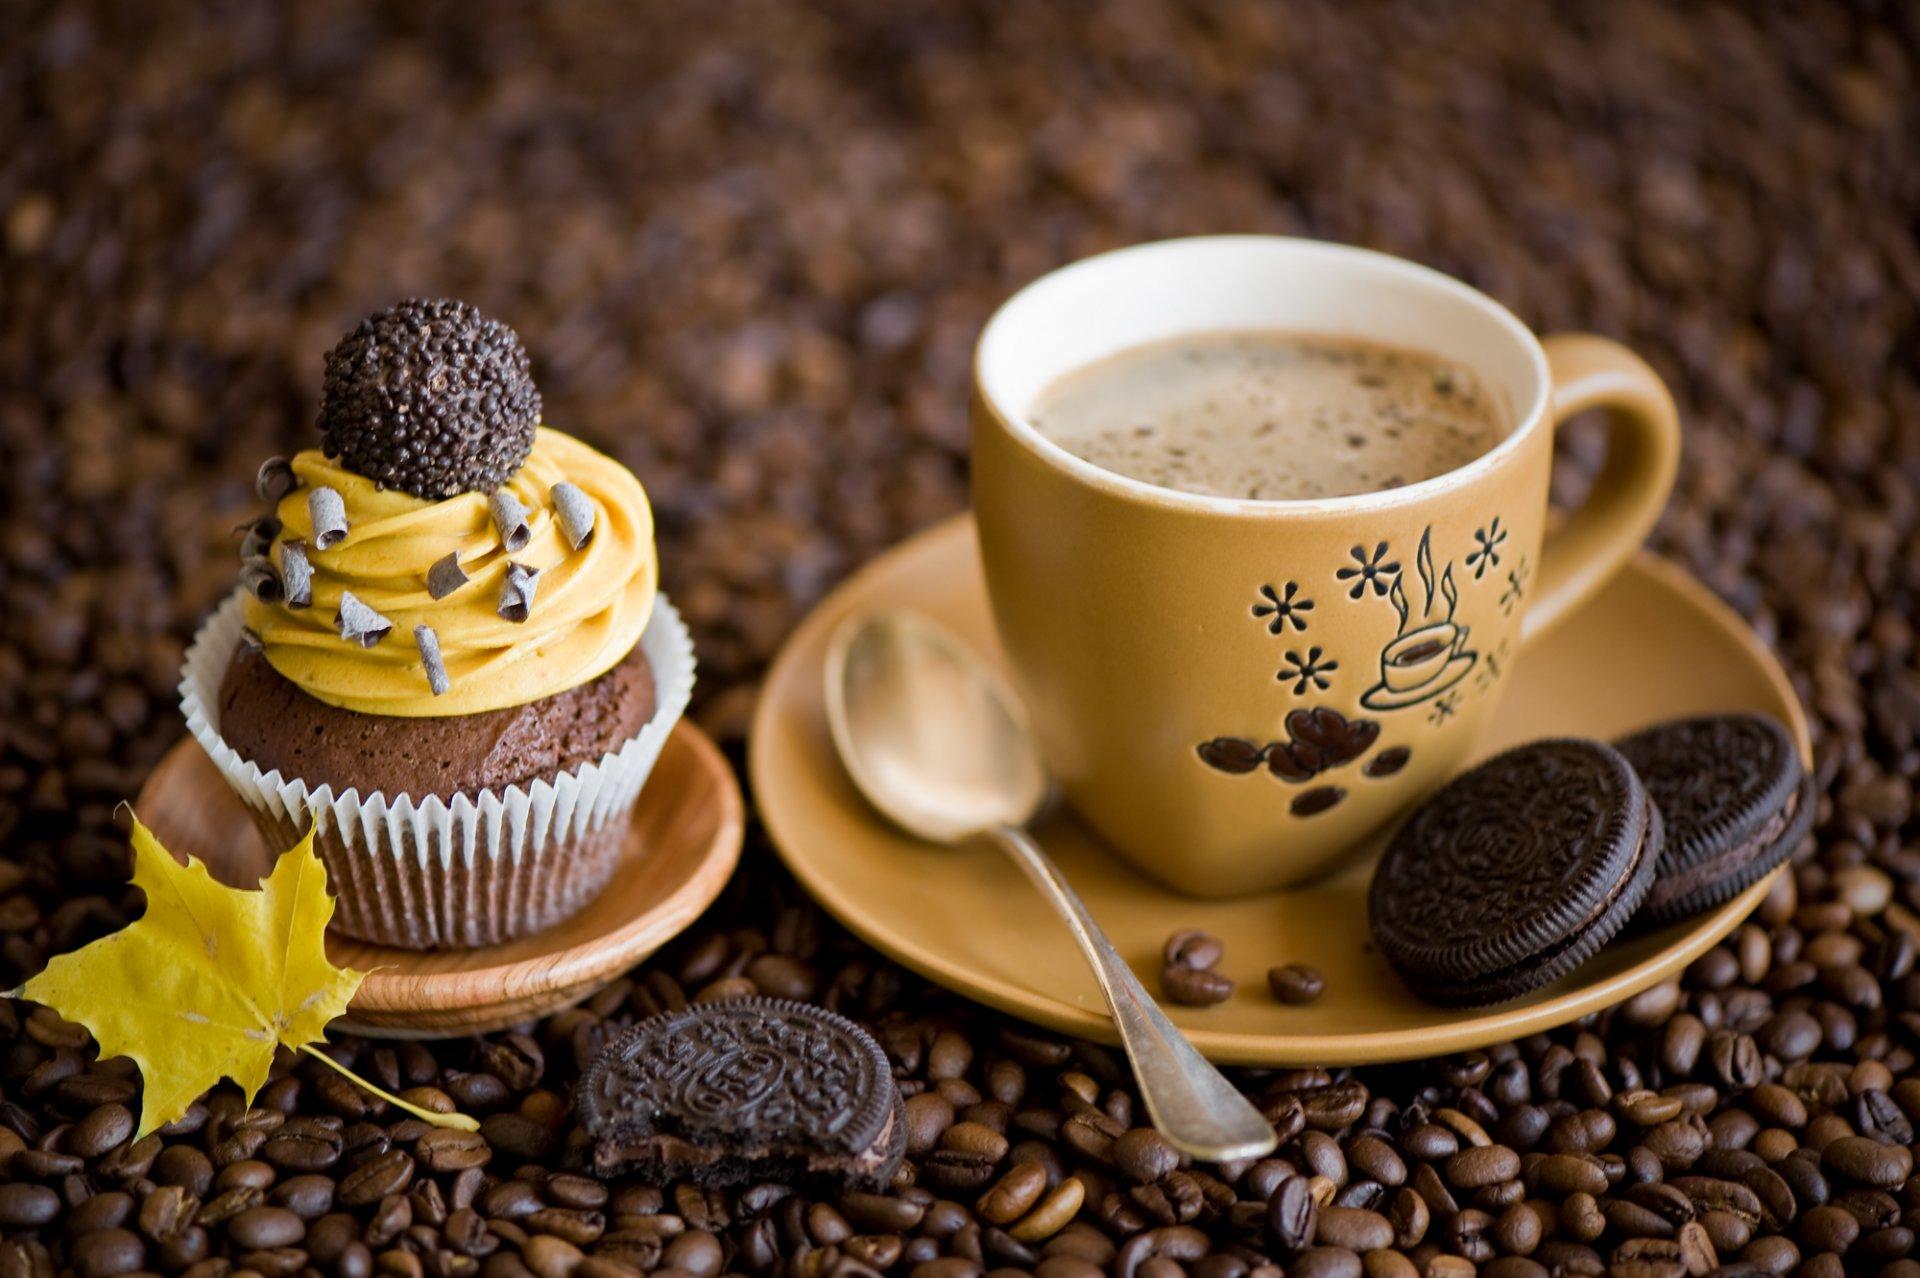 конфета кофе картинки чашка и